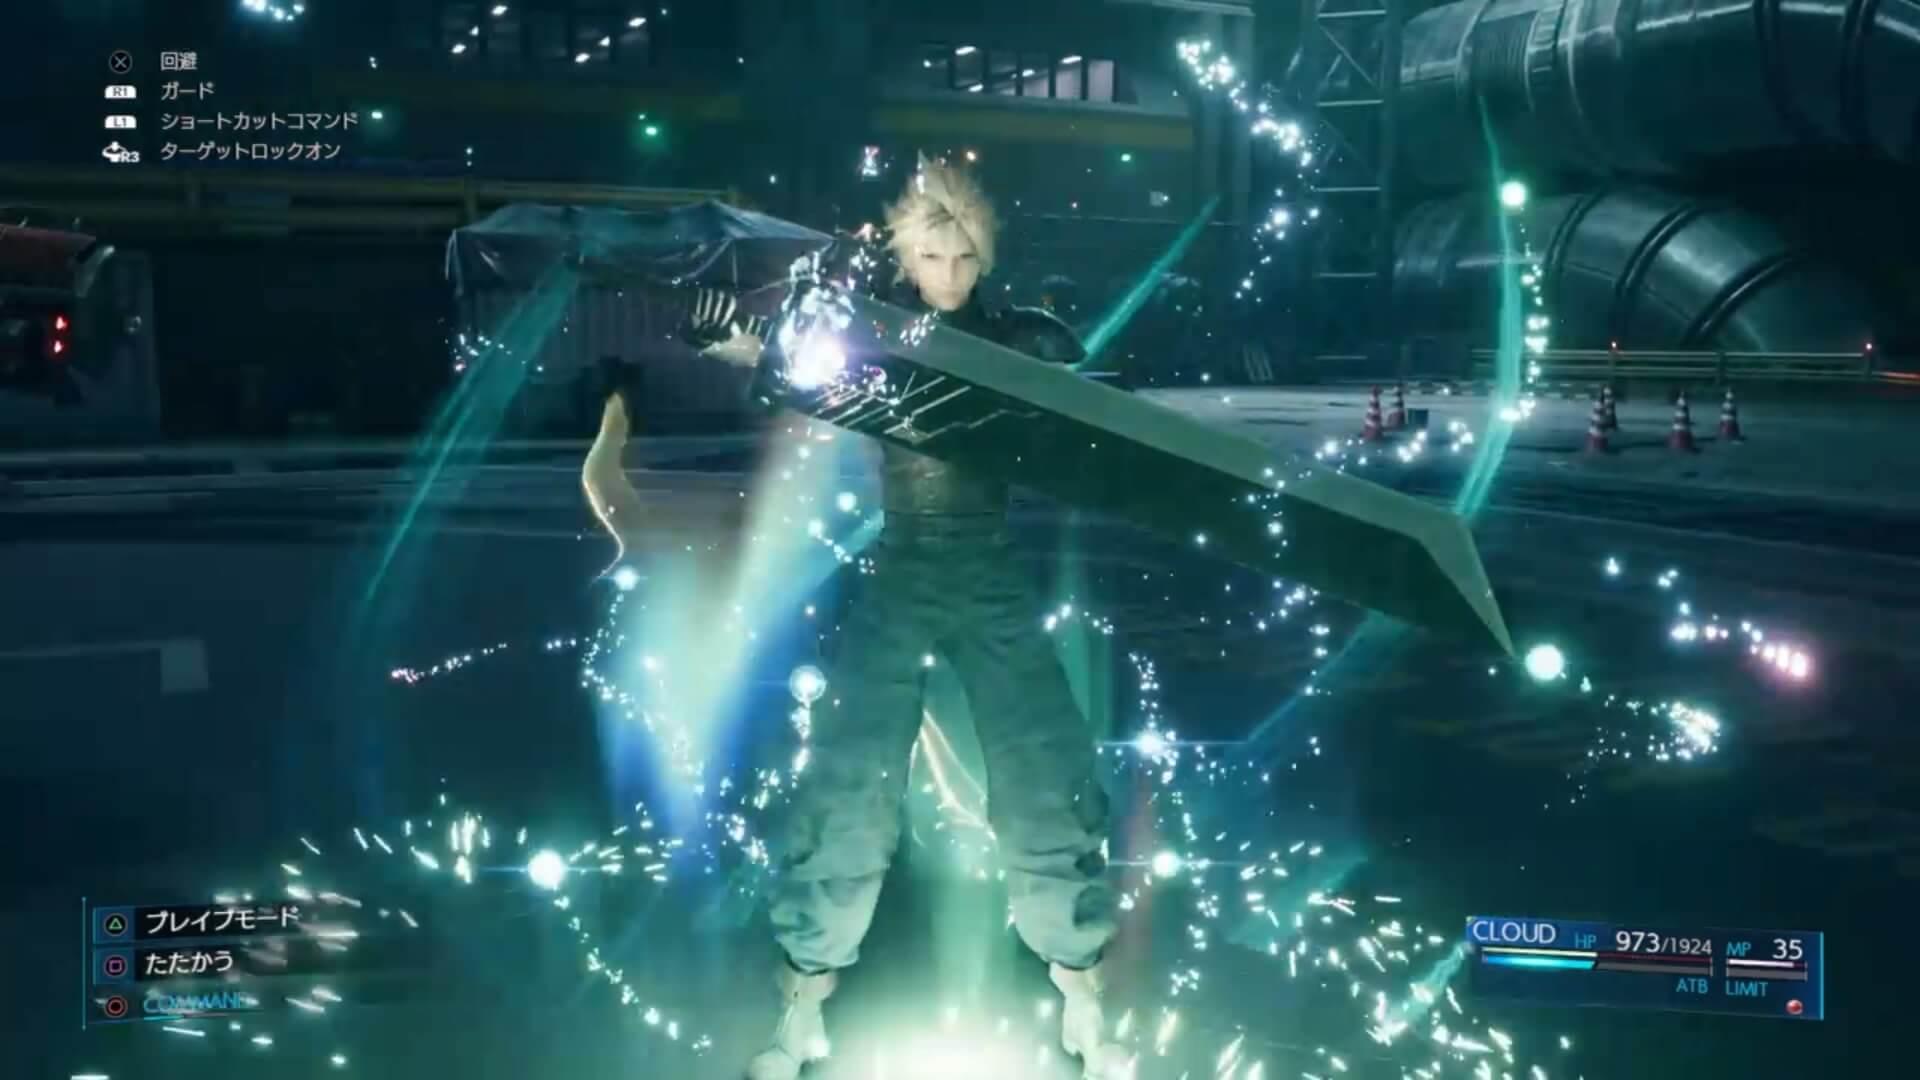 FF7リメイク:召喚獣を召喚する方法・召喚獣のアビリティを使う方法